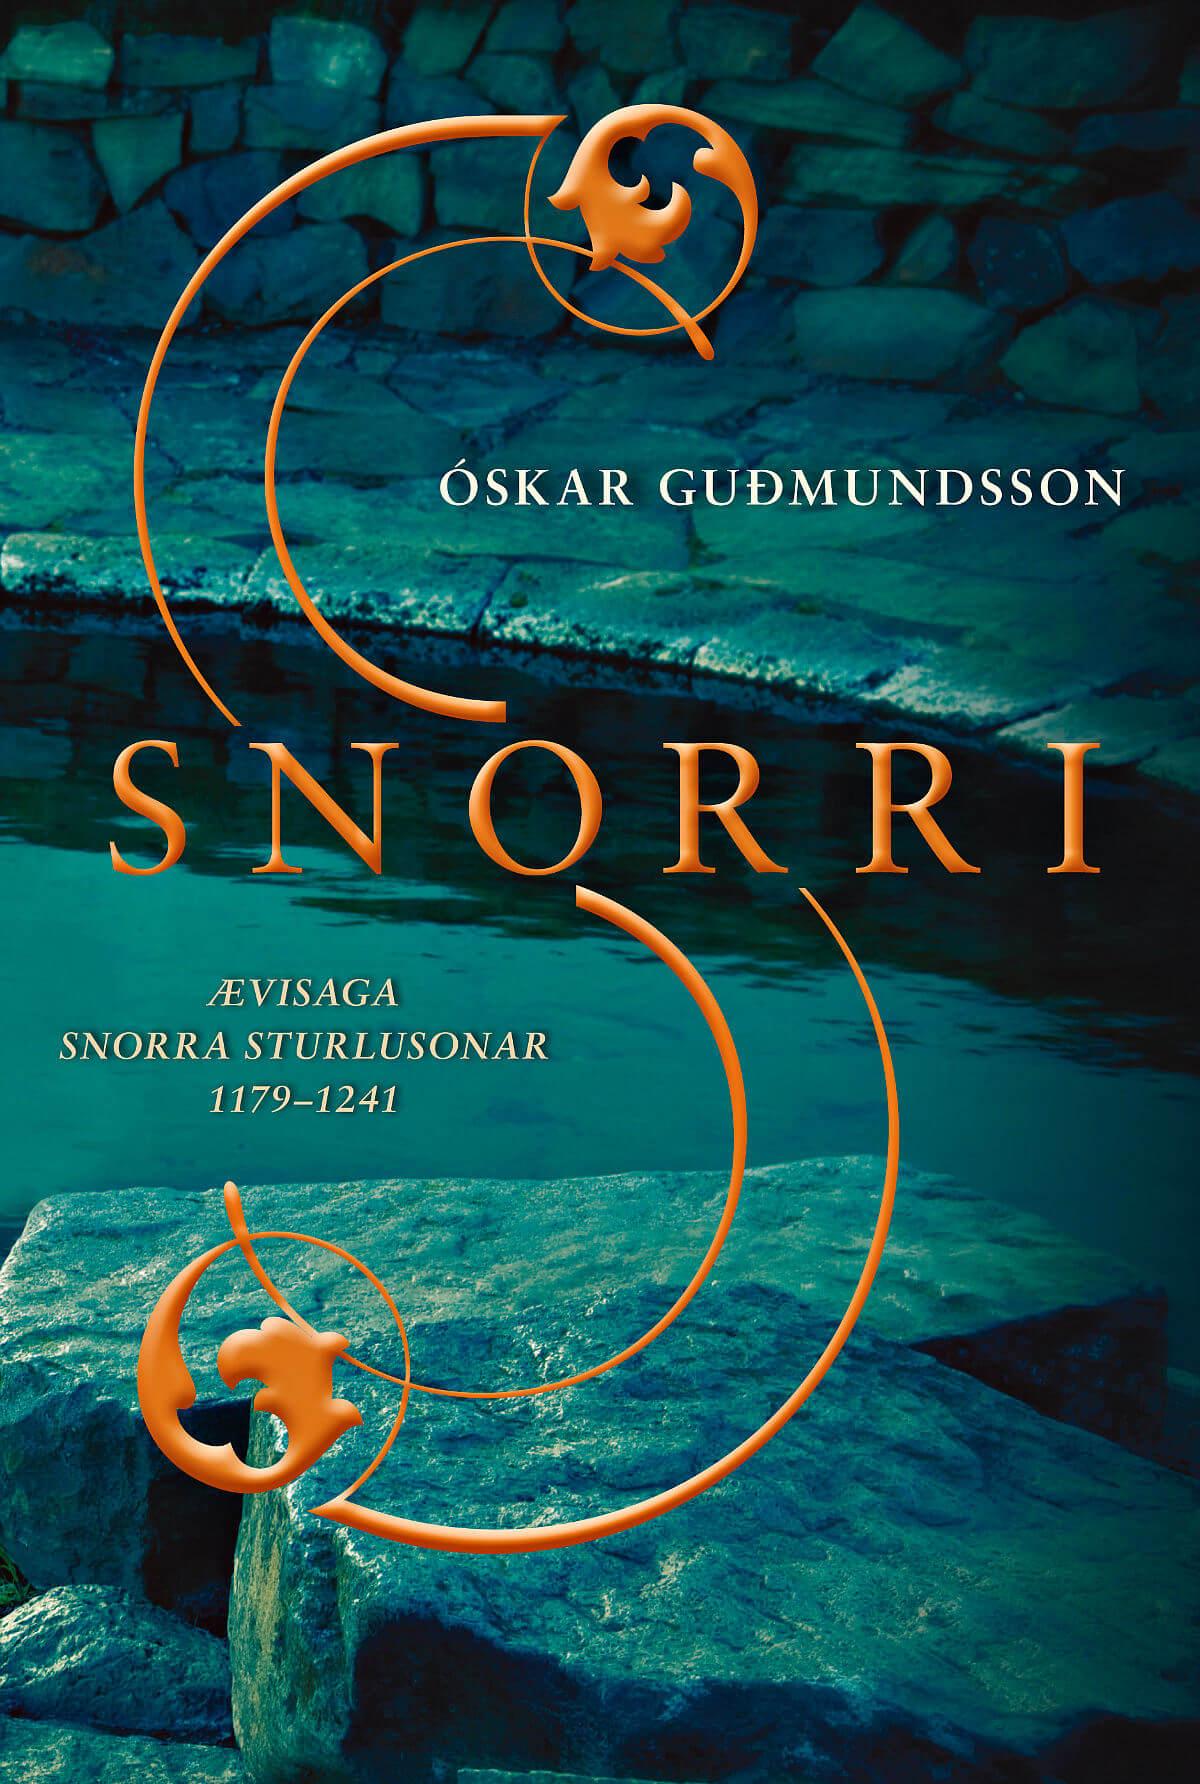 Snorri – Ævisaga 1179-1241